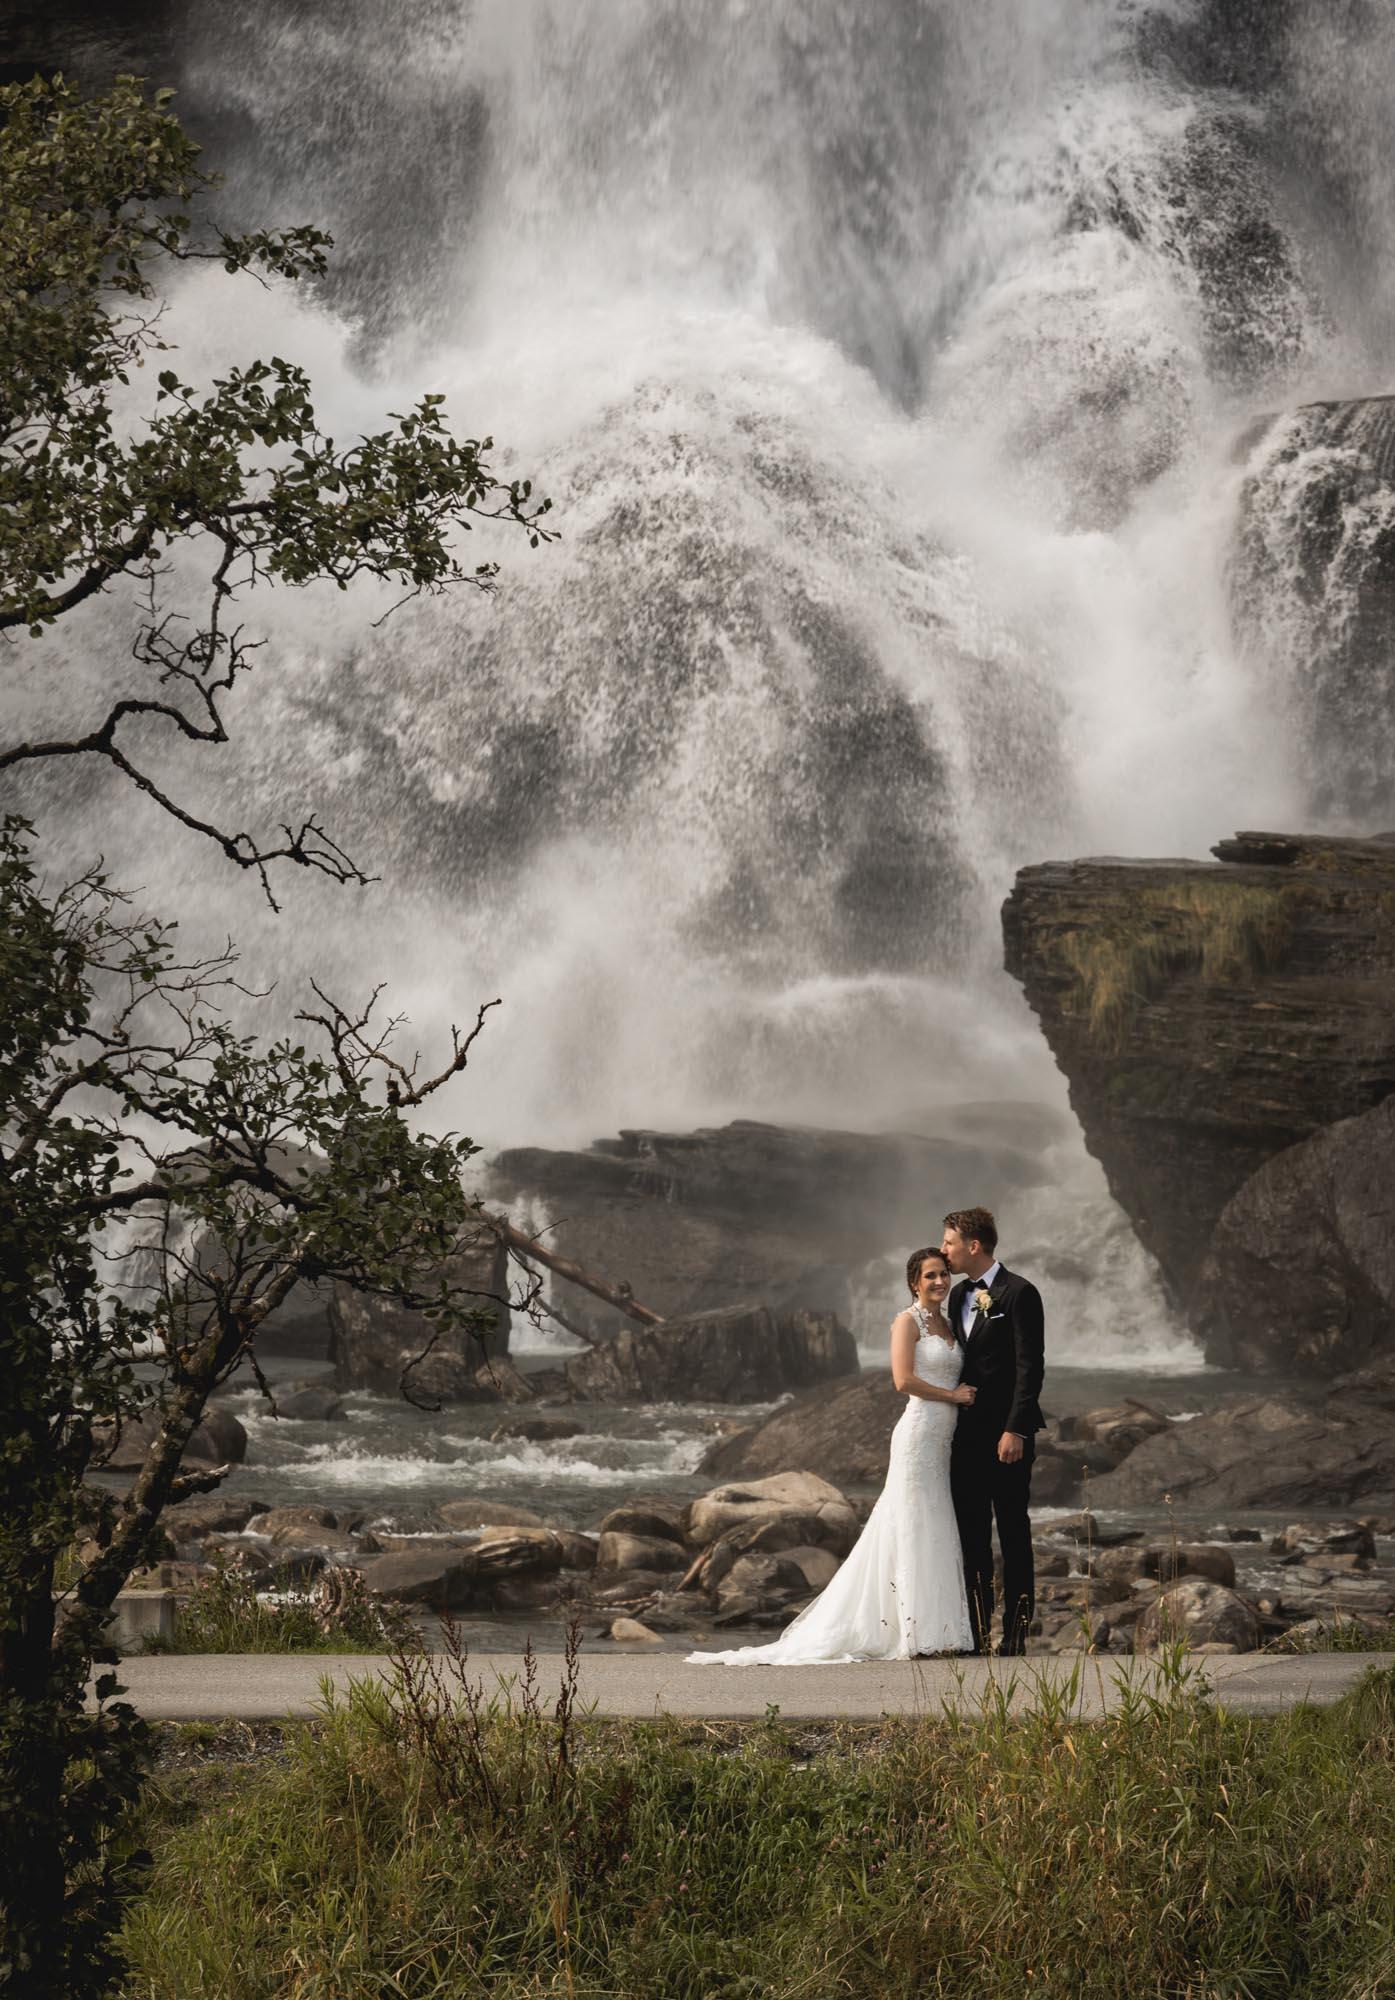 steinsdalsfossen brudepar brudebilde brud brudgom foss hardanger